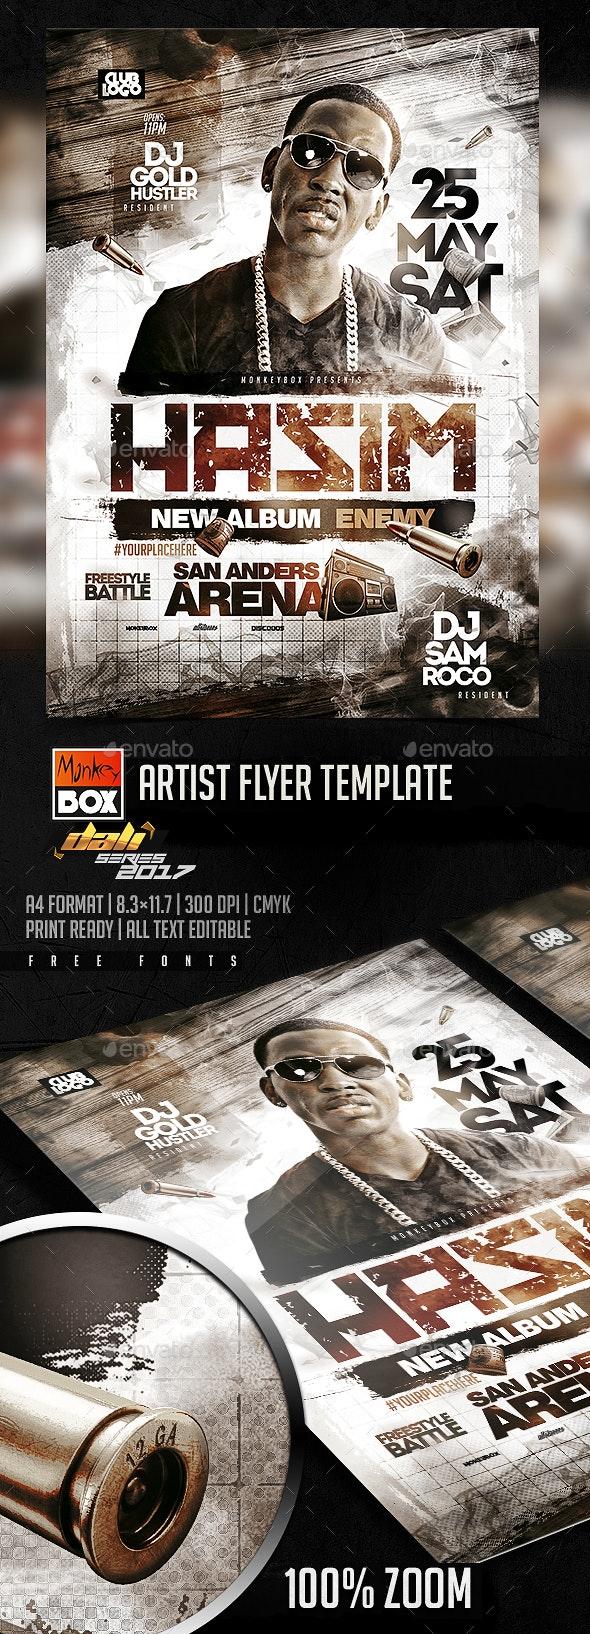 Artist Flyer Template - Flyers Print Templates